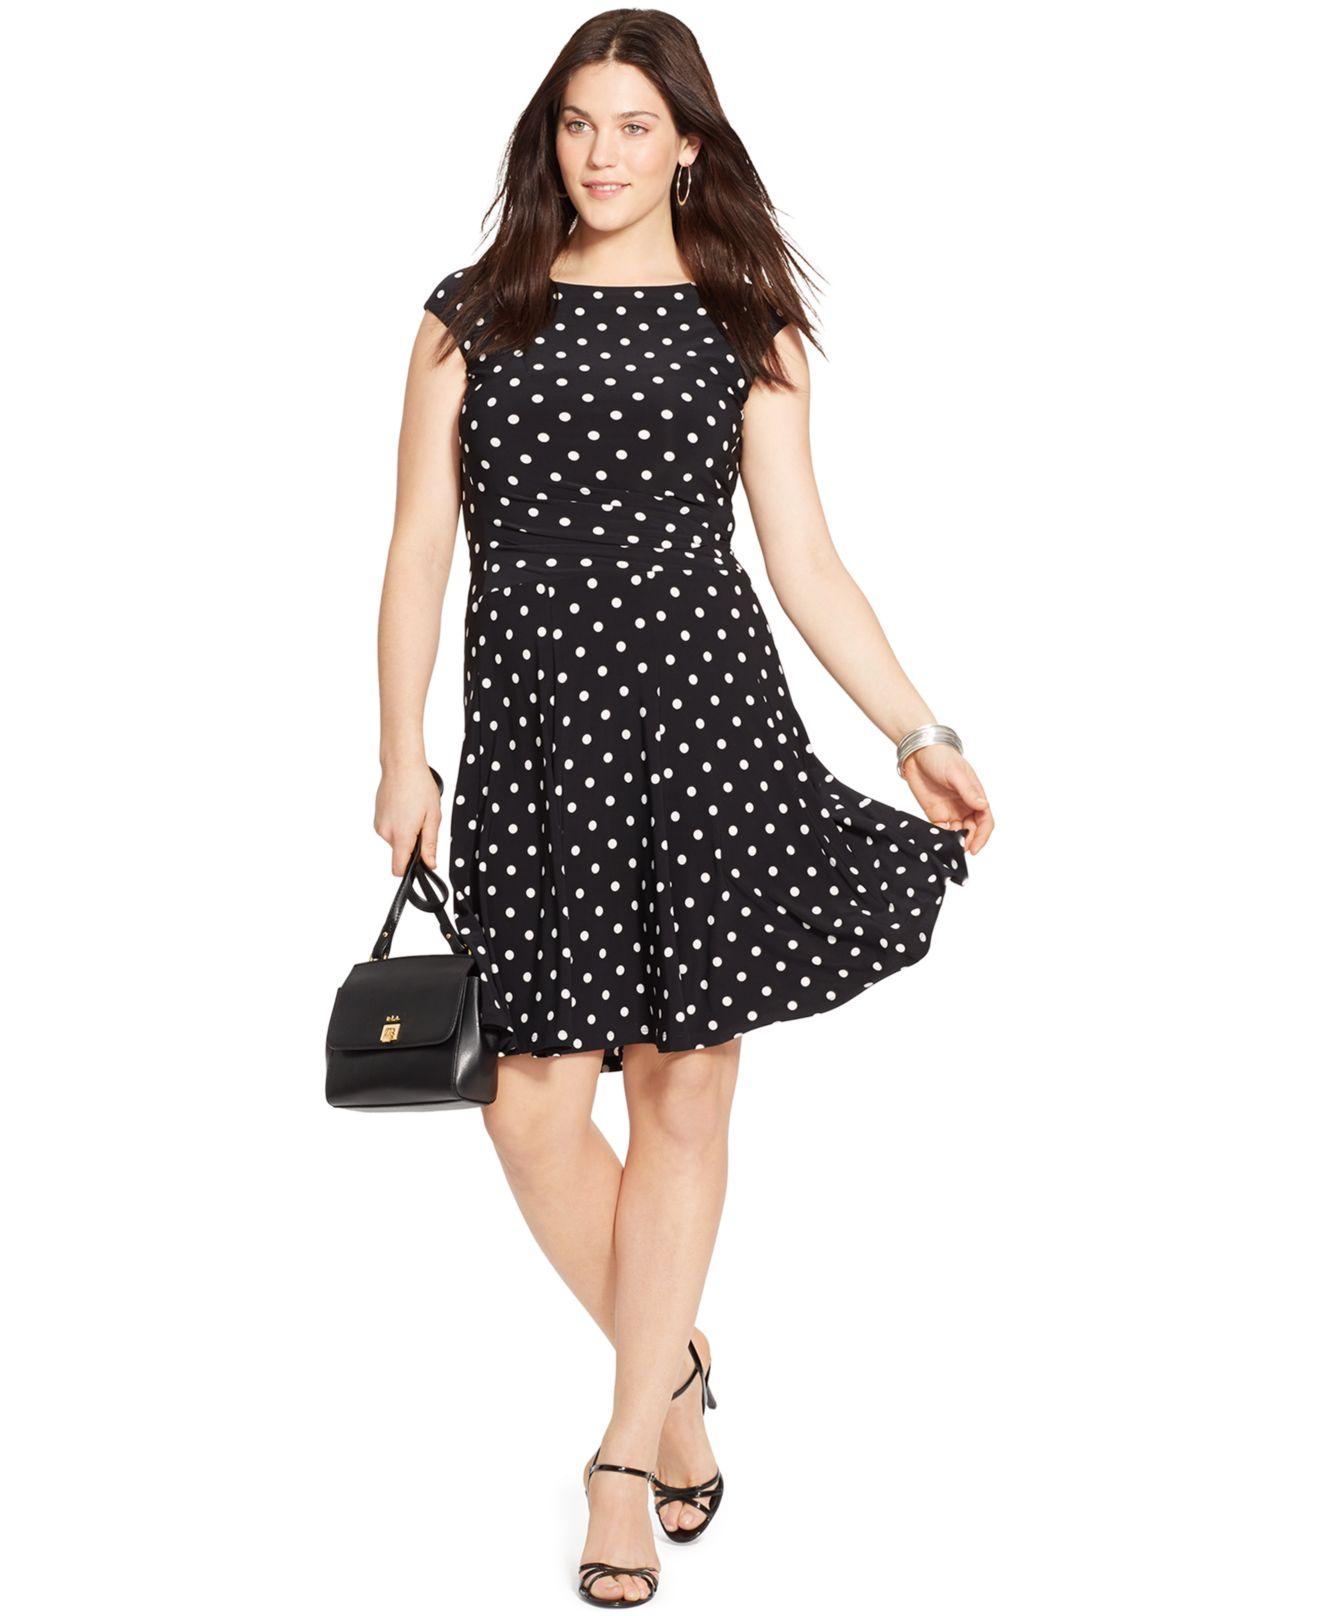 Lyst Lauren By Ralph Lauren Plus Size Sleeveless Polka Dot Dress